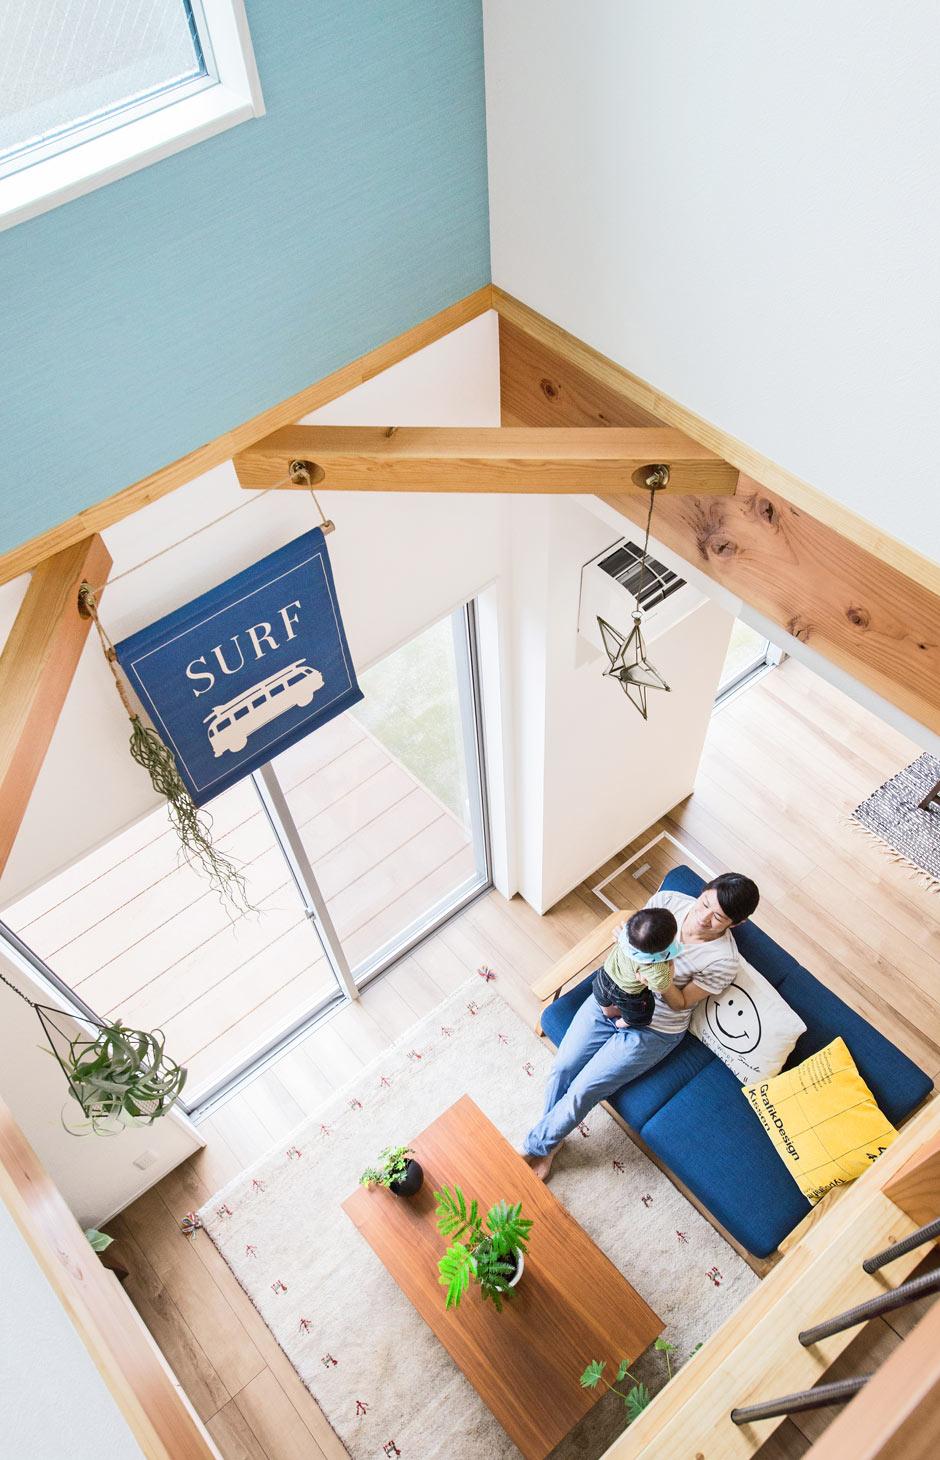 illi-to design 鳥居建設21【デザイン住宅、趣味、省エネ】開放的な吹き抜け空間も、濃淡のブルーが爽やか